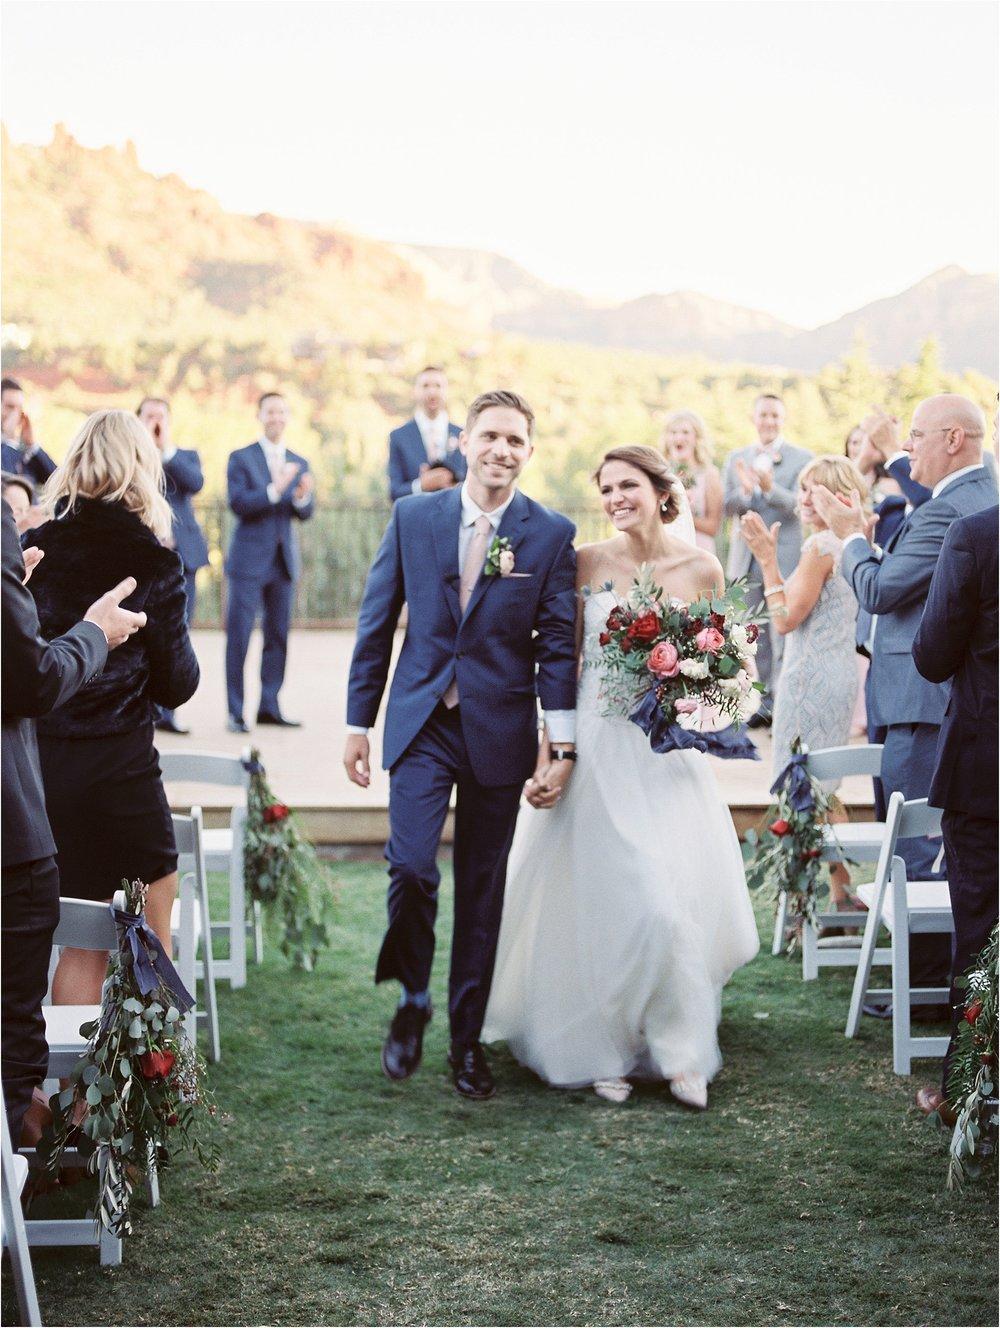 Sarah Jane Photography Film Hybrid Scottsdale Phoenix Arizona Destination Wedding Photographer sedona lauberge jon paige_0061.jpg